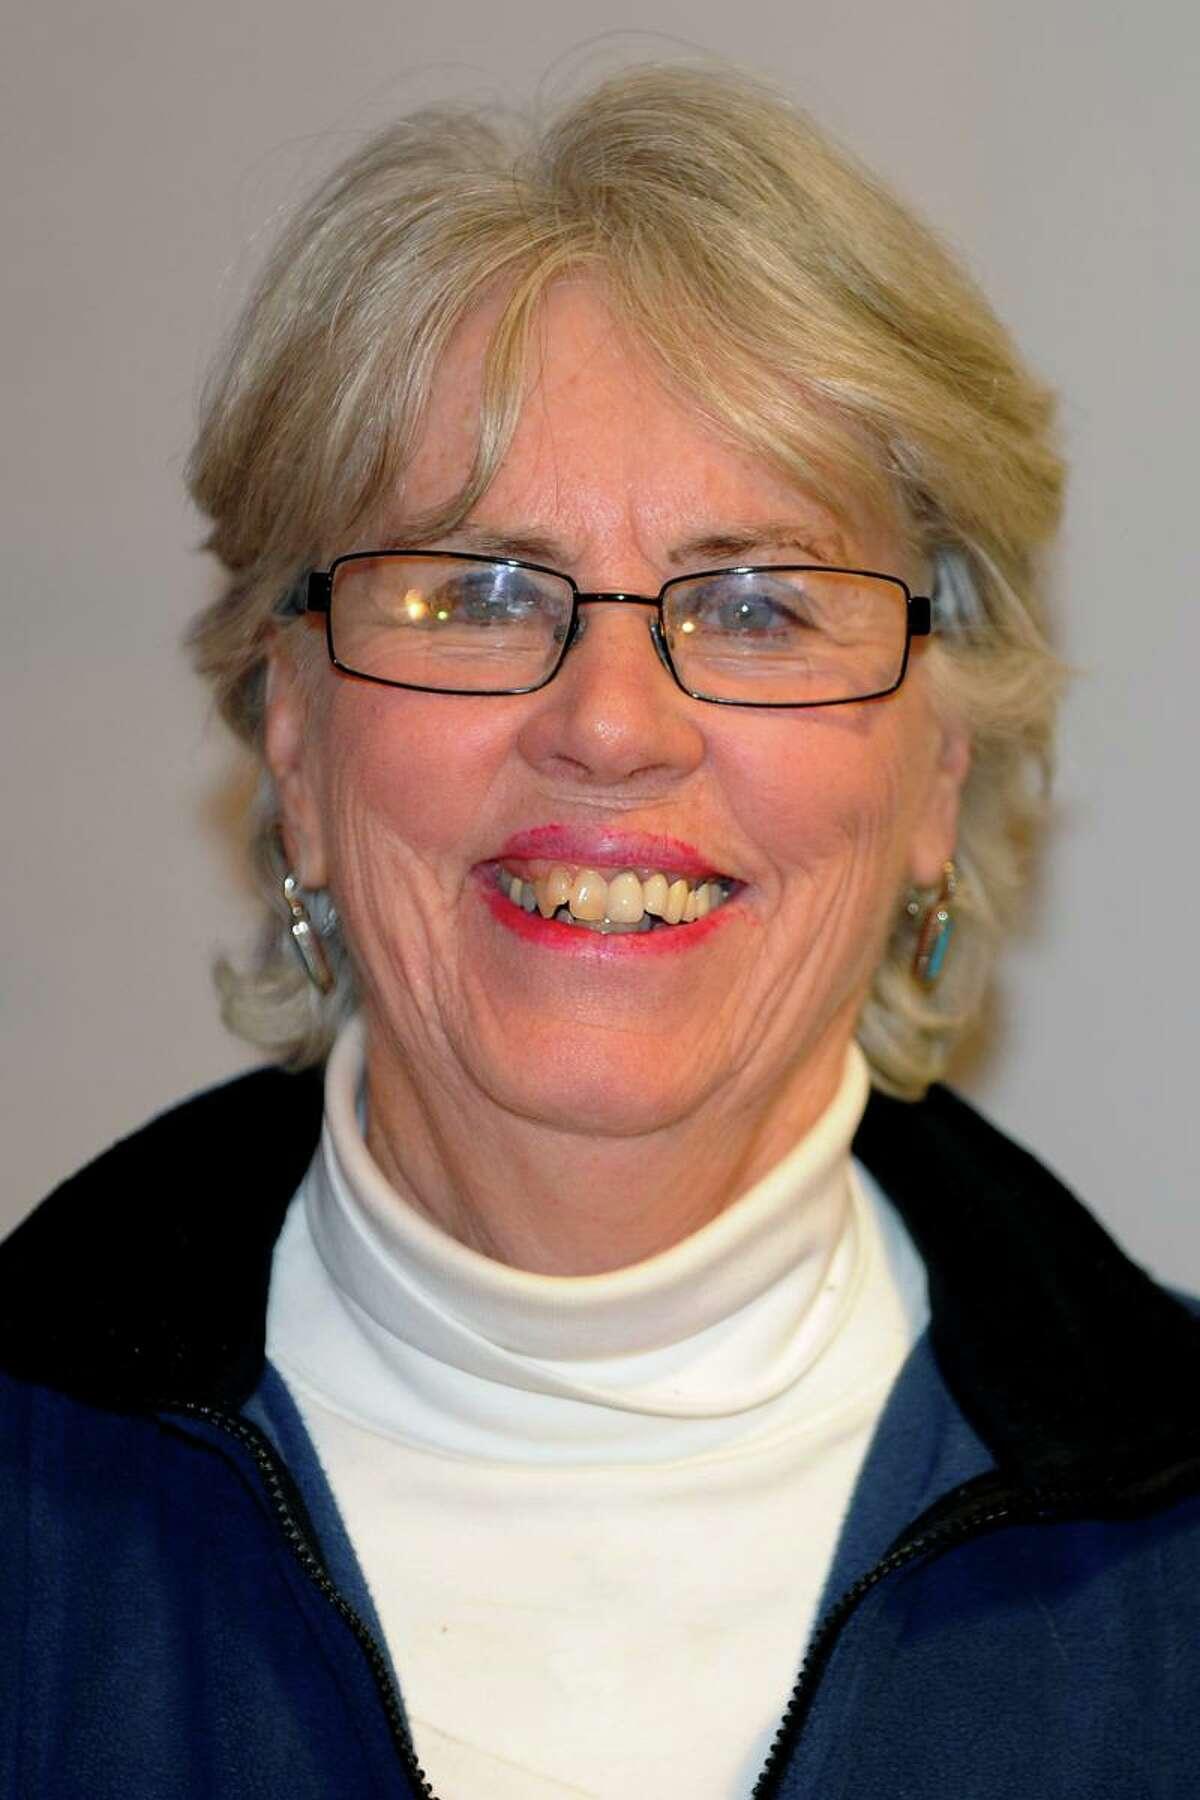 Judy Larkin Nicolari is seeking a fourth term as Ansonia's city treasurer running on the Republican party ticket.